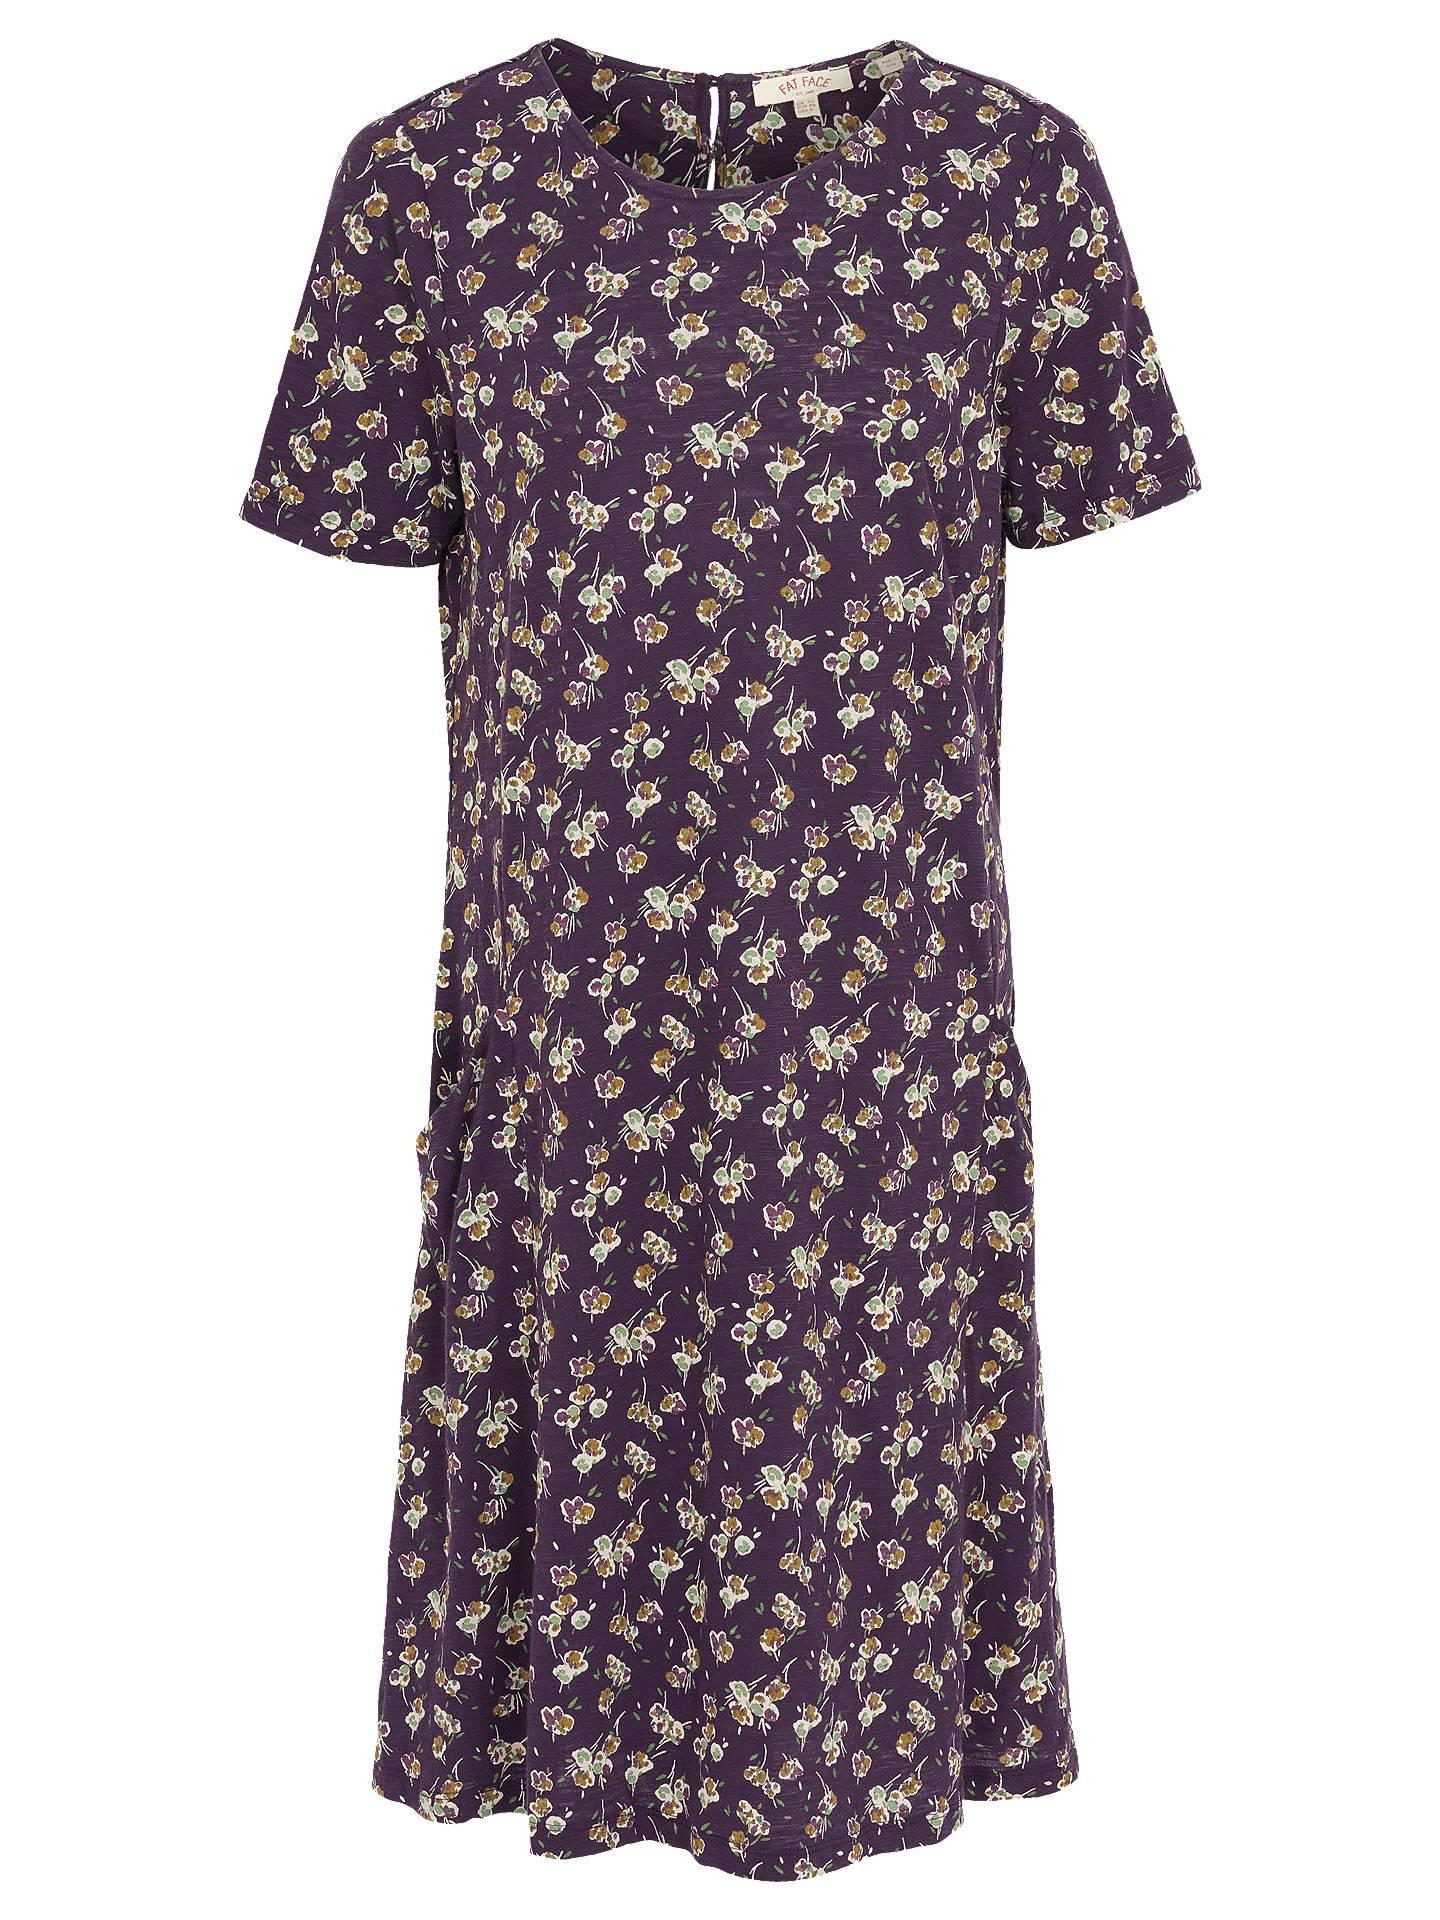 Fat Face Simone Teatime Floral Dress, Aubergine at John Lewis & Partners